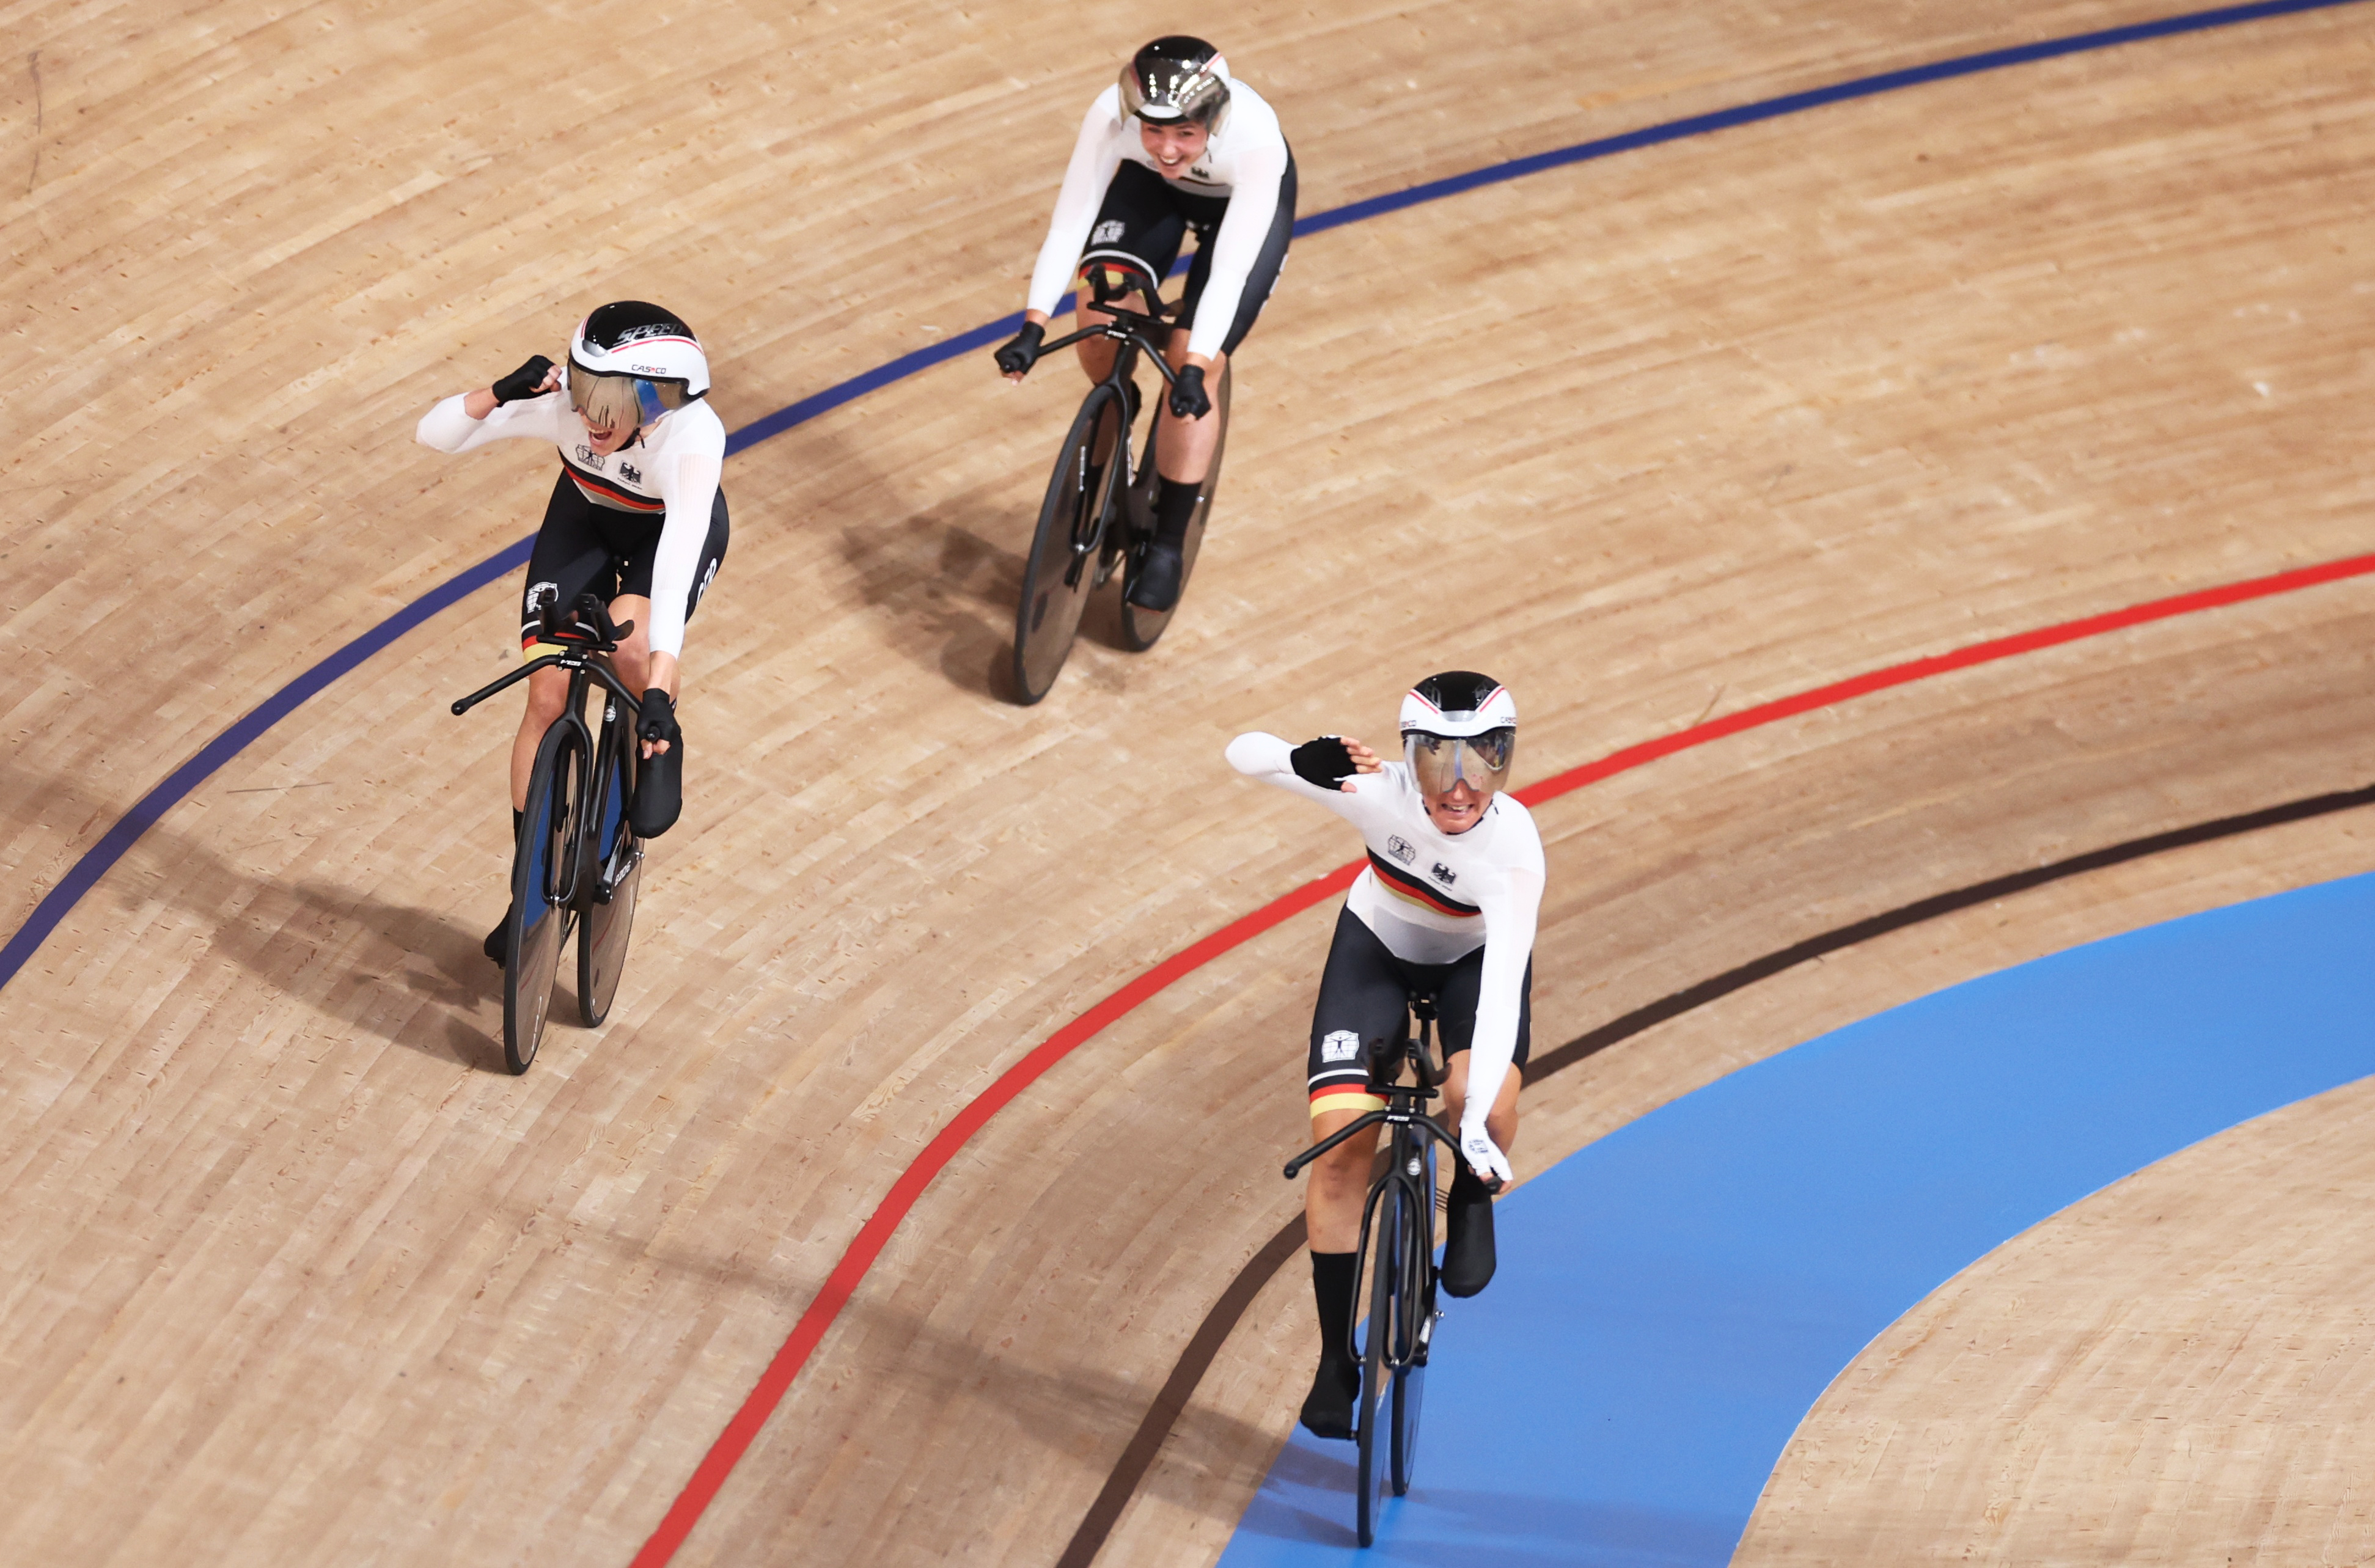 Tokyo 2020 Olympics - Cycling - Track - Women's Team Pursuit - Gold Final - Izu Velodrome, Shizuoka, Japan - August 3, 2021.  Team Germany celebrate winning gold. REUTERS/Christian Hartmann